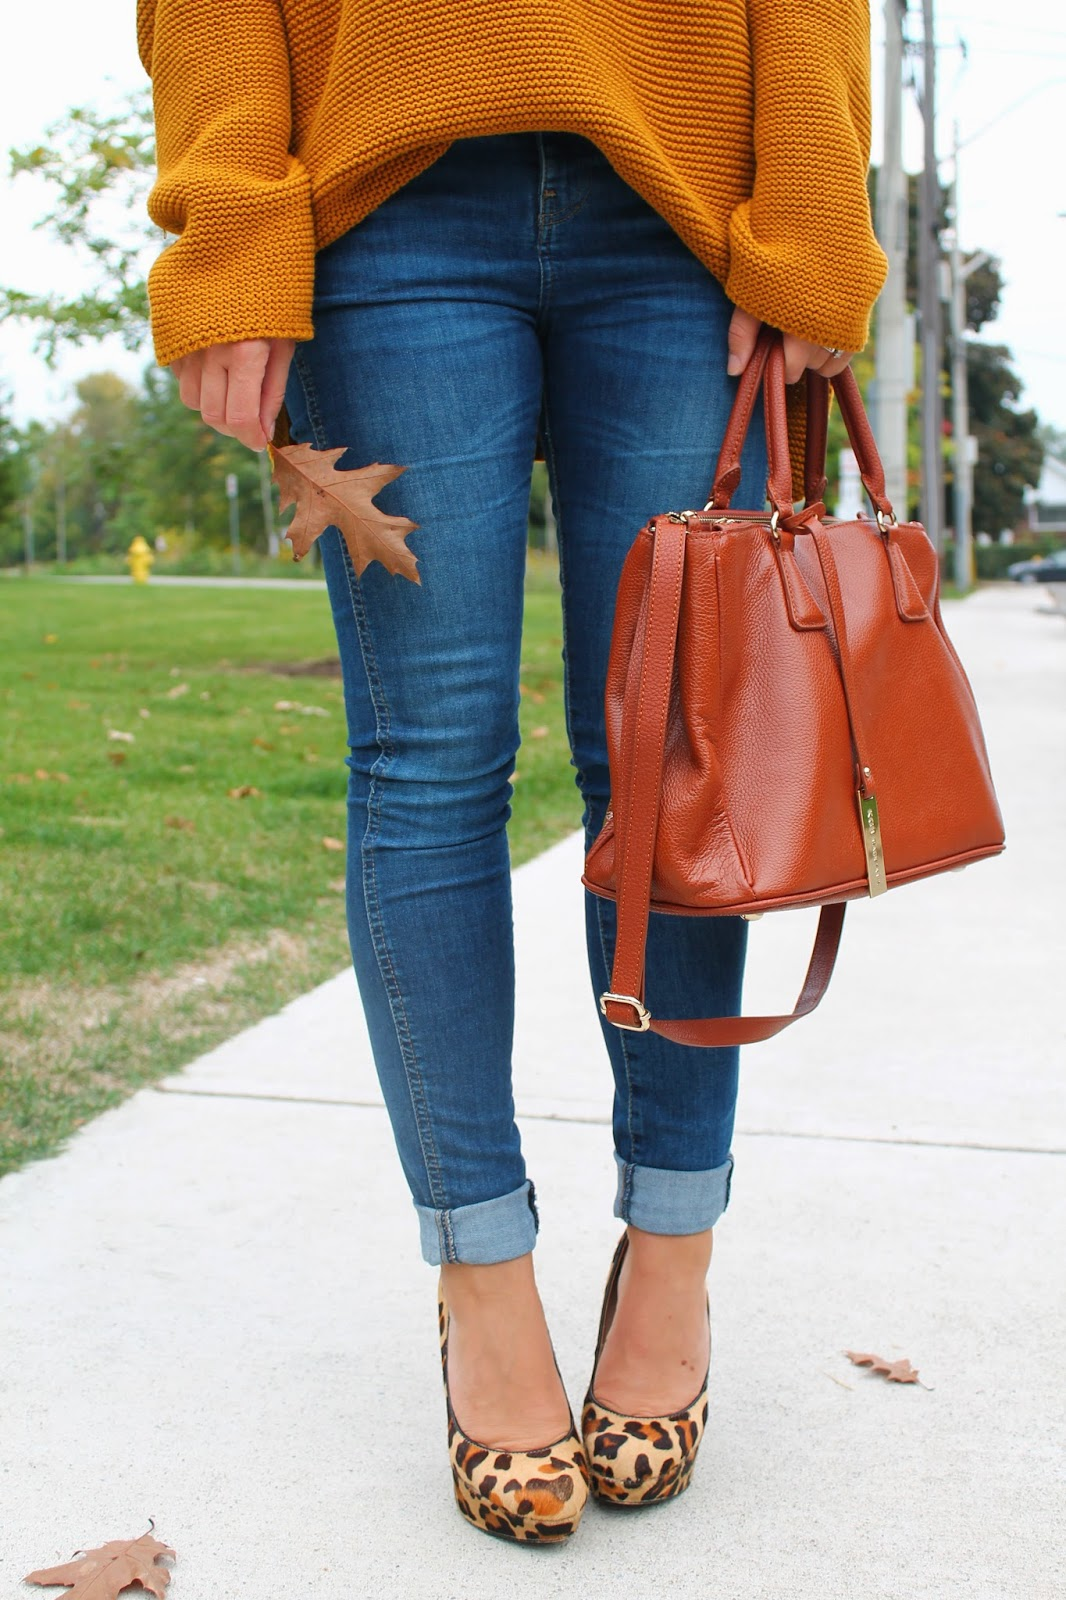 uk blogger, leopard print, Oversized sweater, zara sweater, fall trend, fall sweater, blogerke, dzemper, toronto fashion blogger, toronto street style